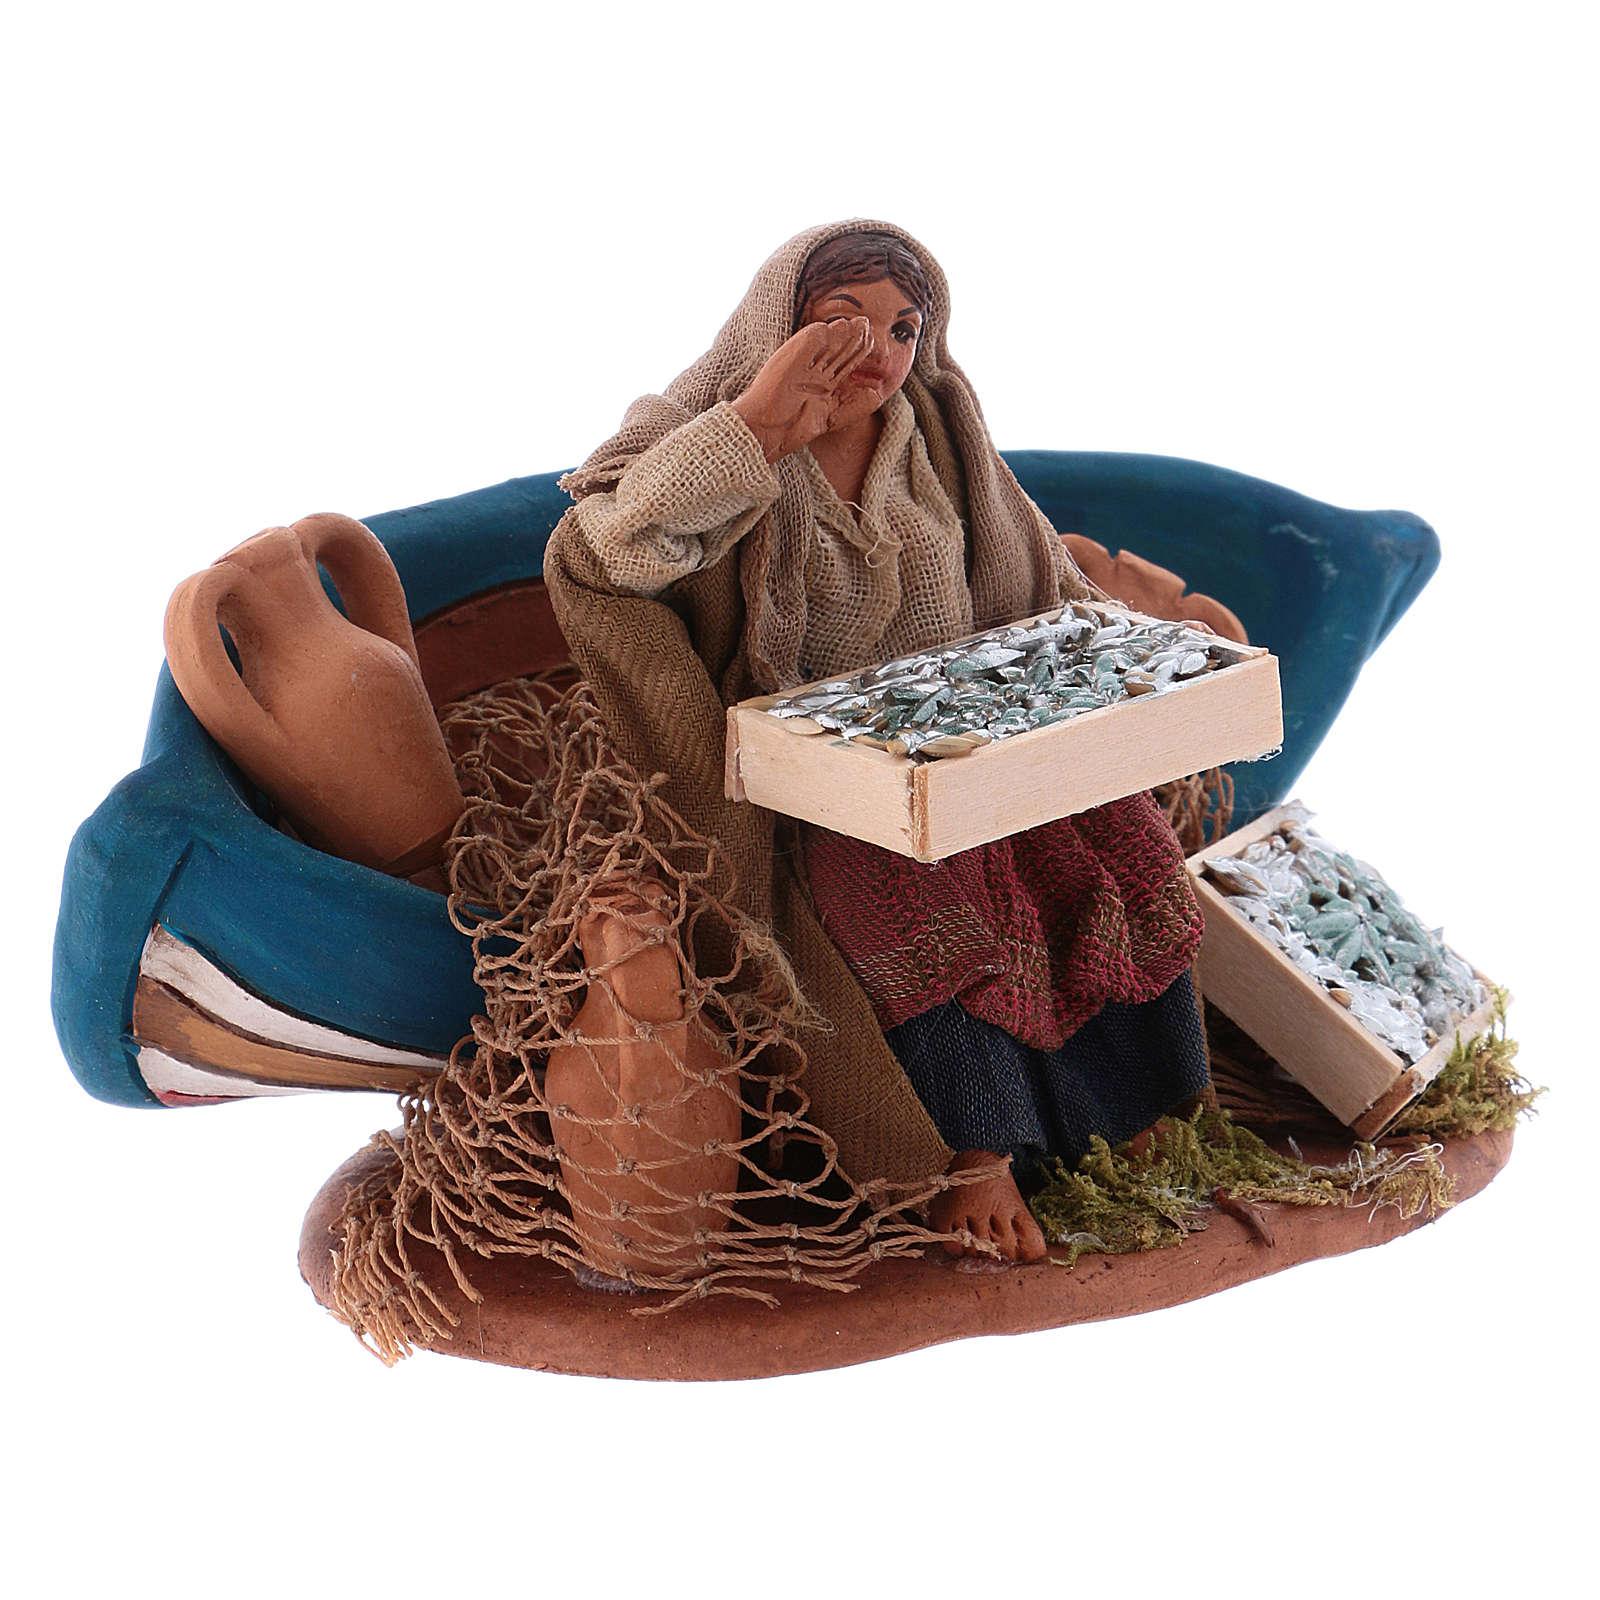 Fisherwoman with boat, Neapolitan Nativity 10cm 4